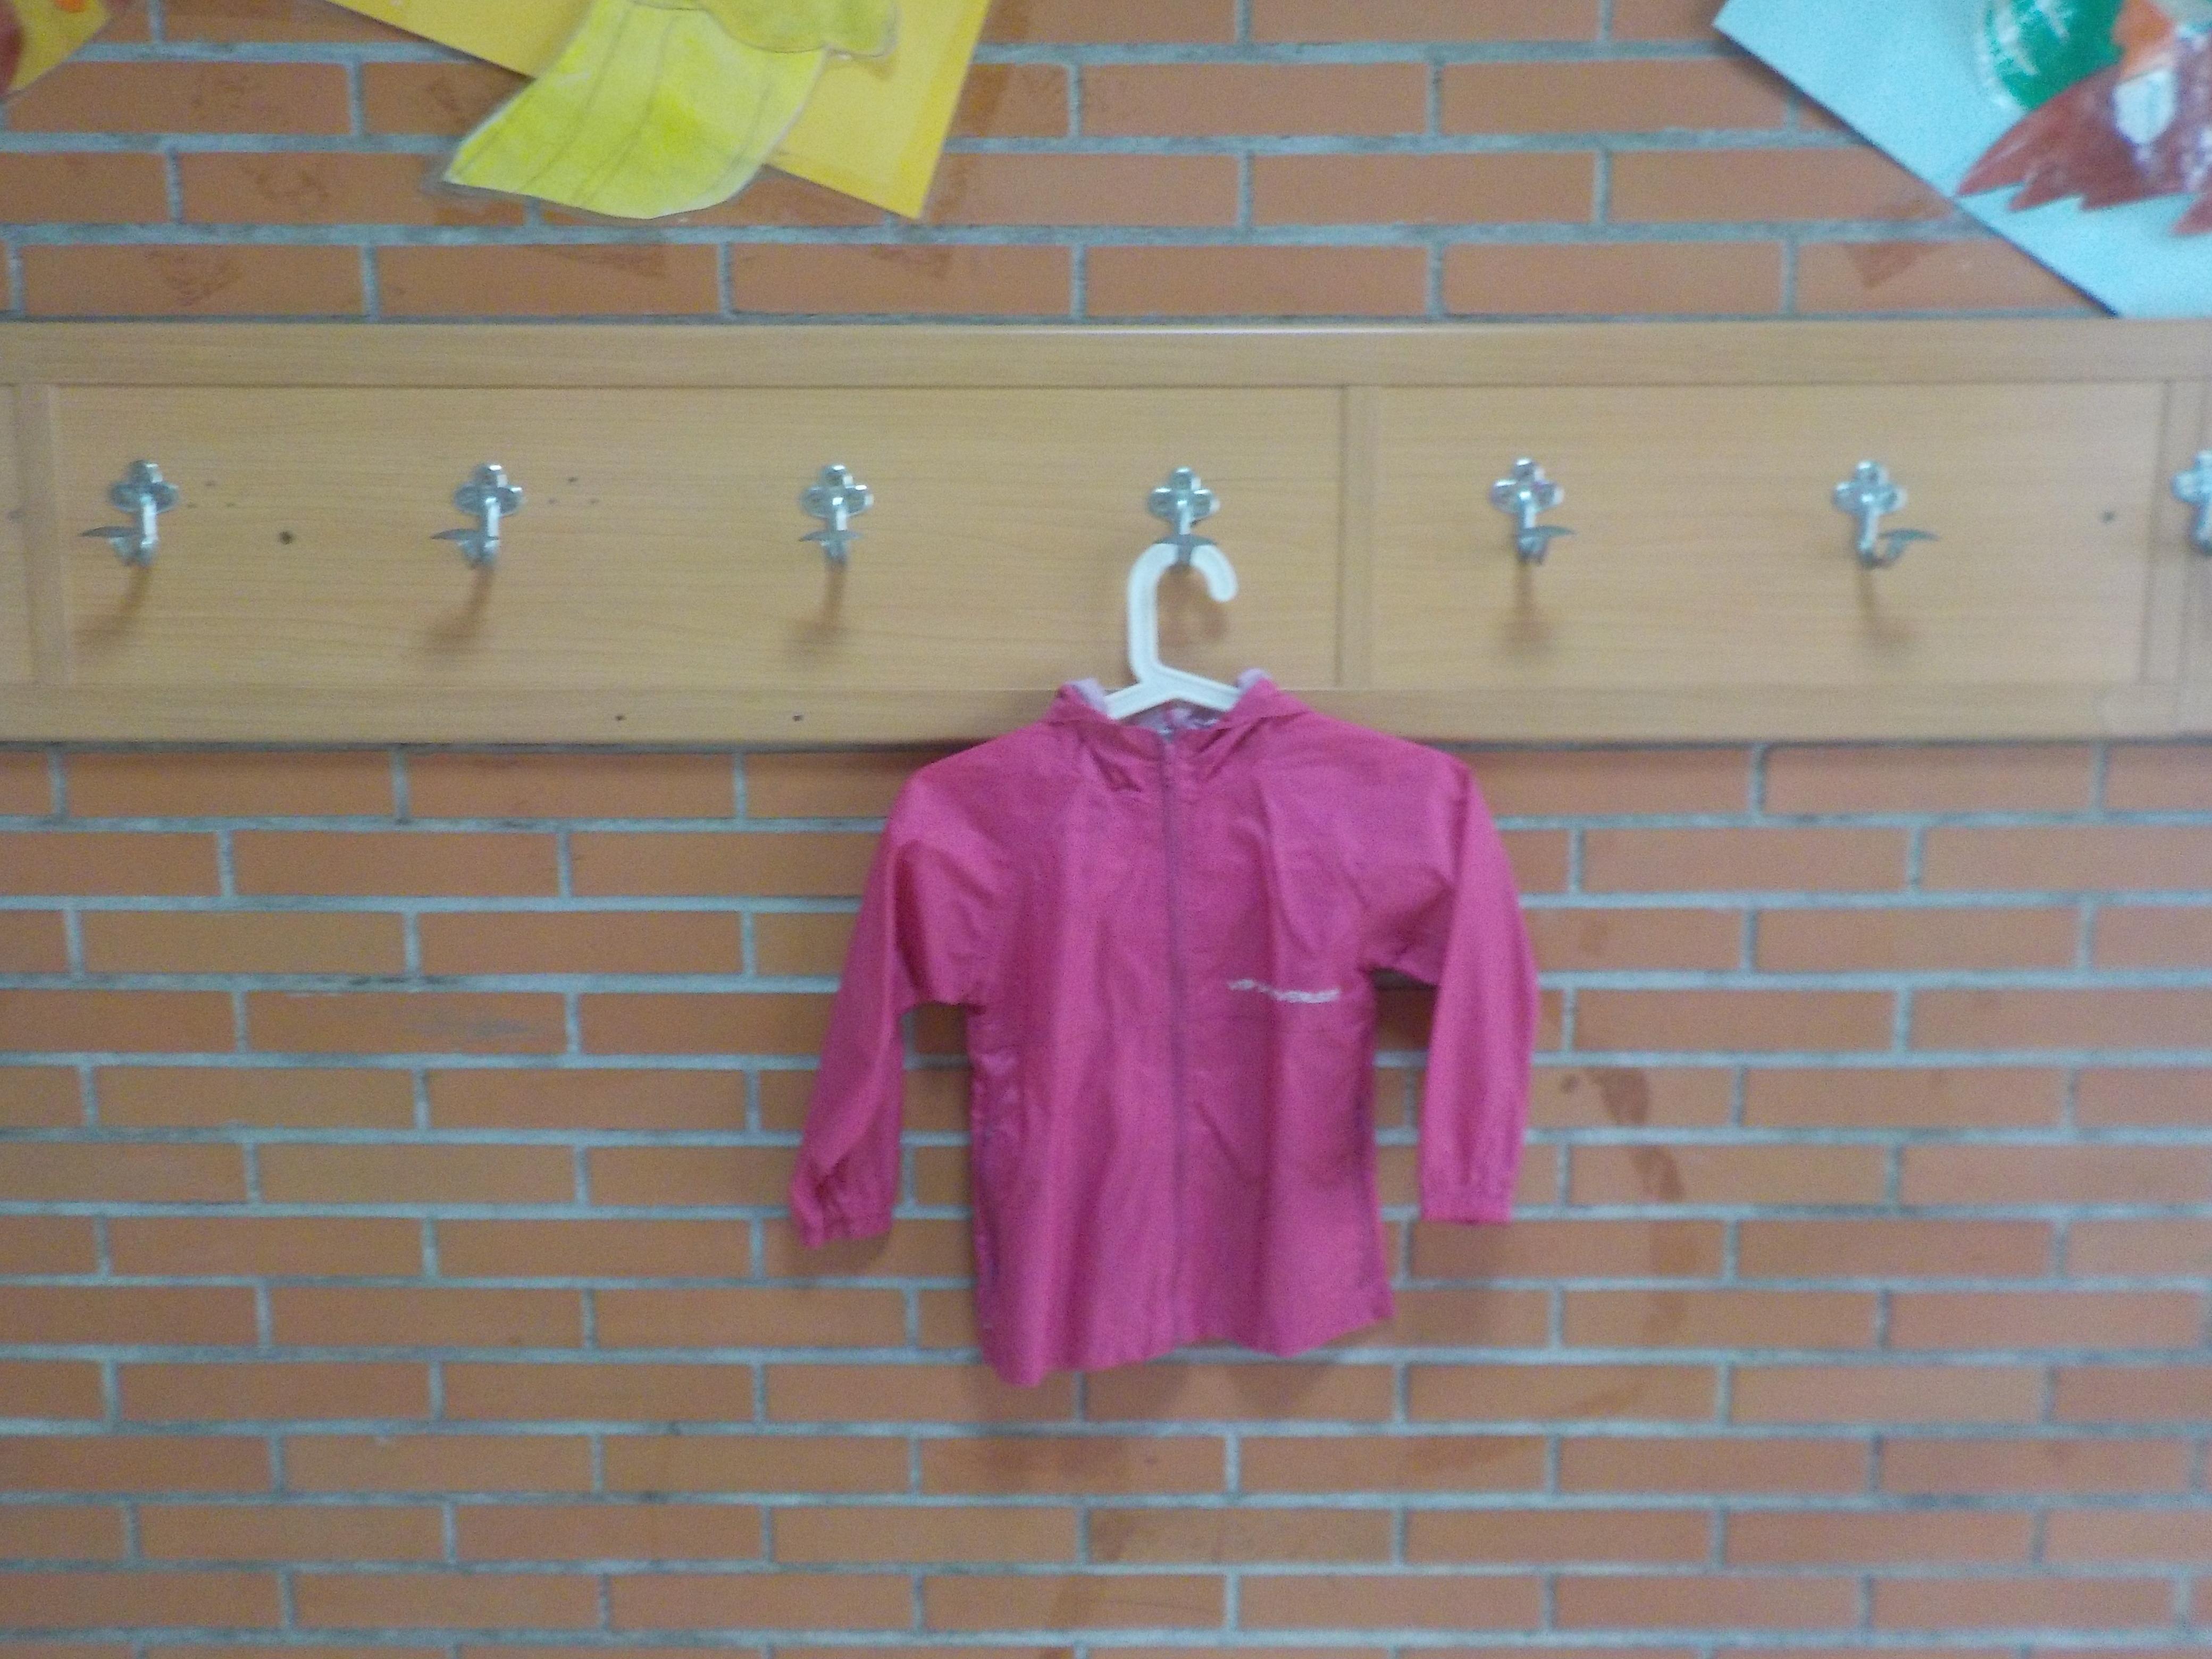 Catalogo de ropa olvidada 1  2018 16